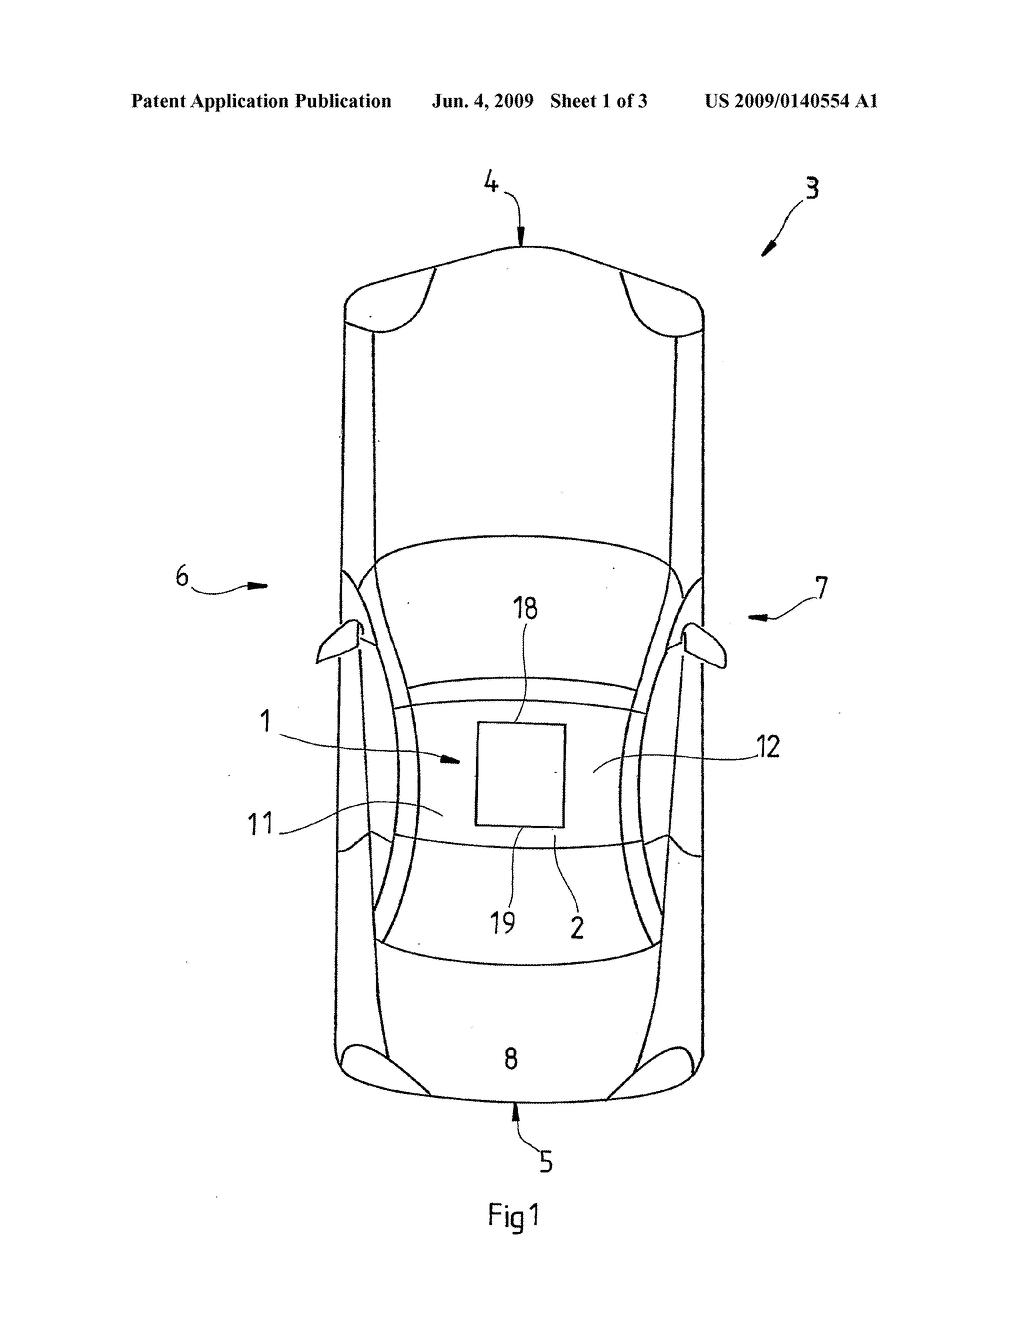 Harley Davidson Cv Carb Diagram Also Universal Relay Wiring Diagram